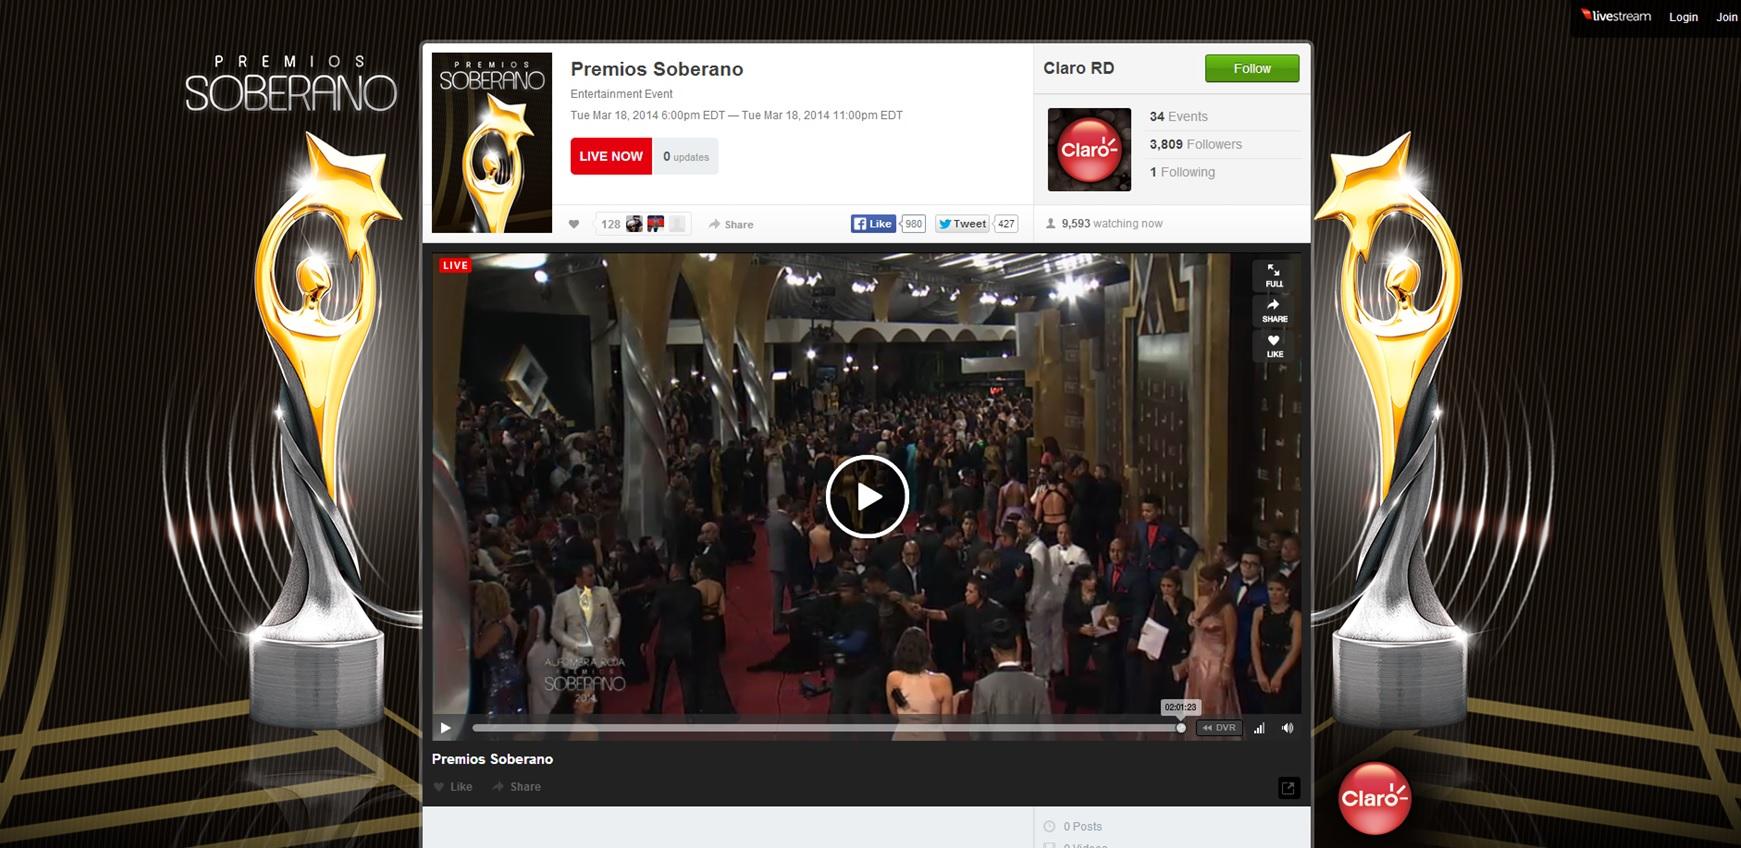 Transmisión en Vivo premios Soberano 2014